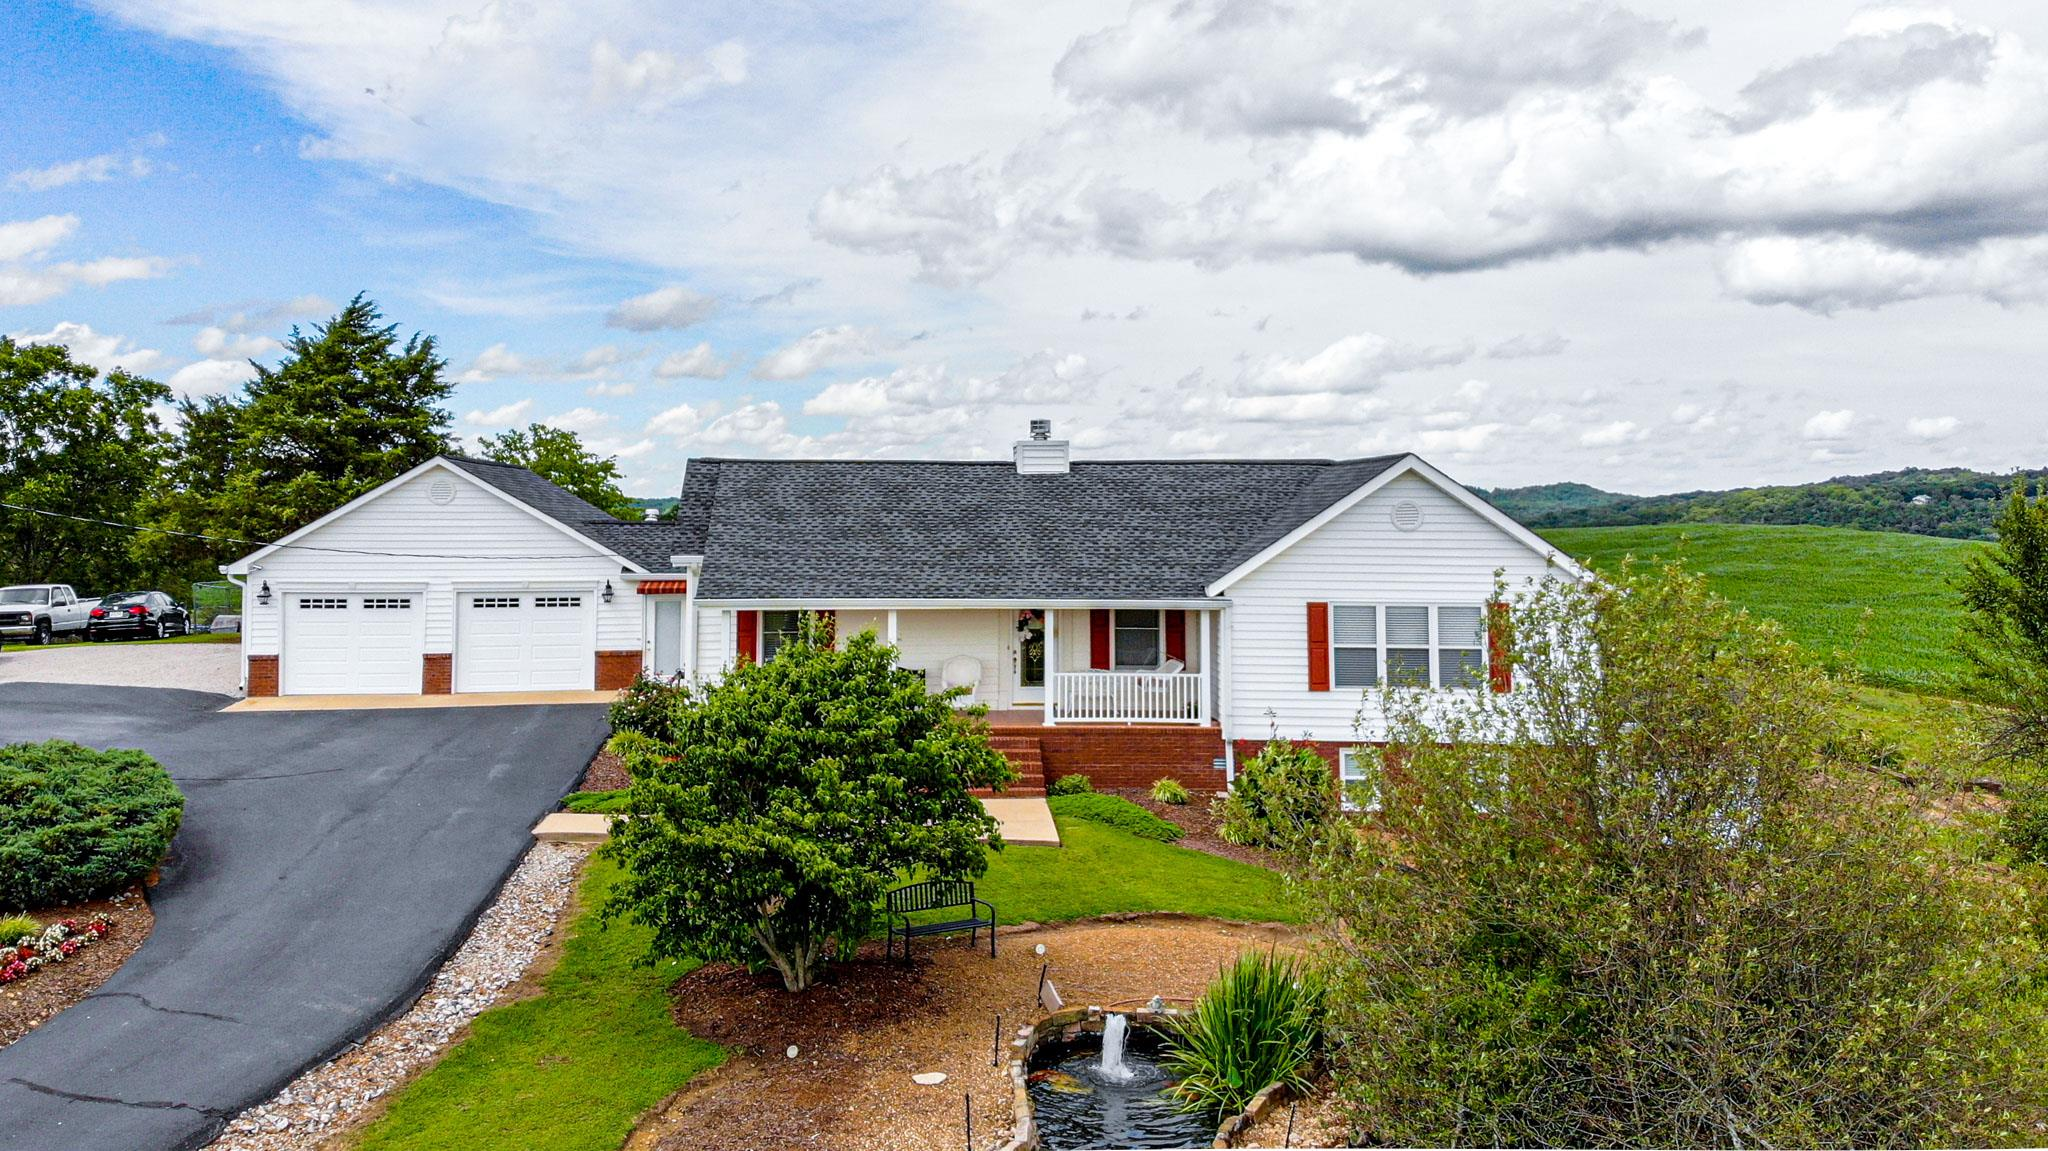 1329 Vinta Mill Rd W, Prospect, TN 38477 - Prospect, TN real estate listing